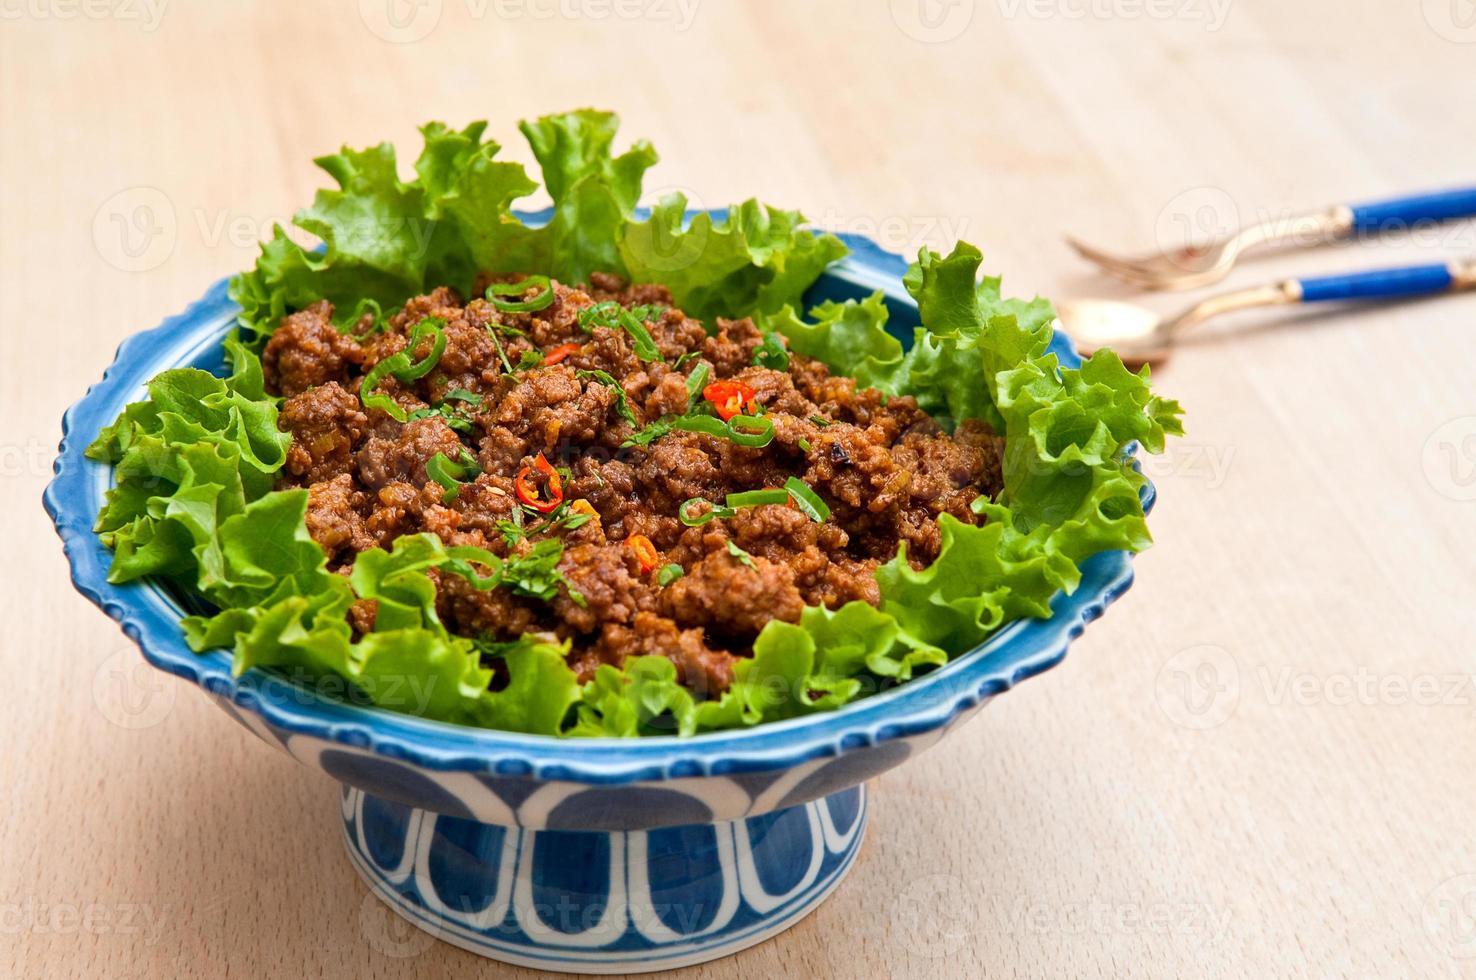 carne moída ao estilo tailandês foto